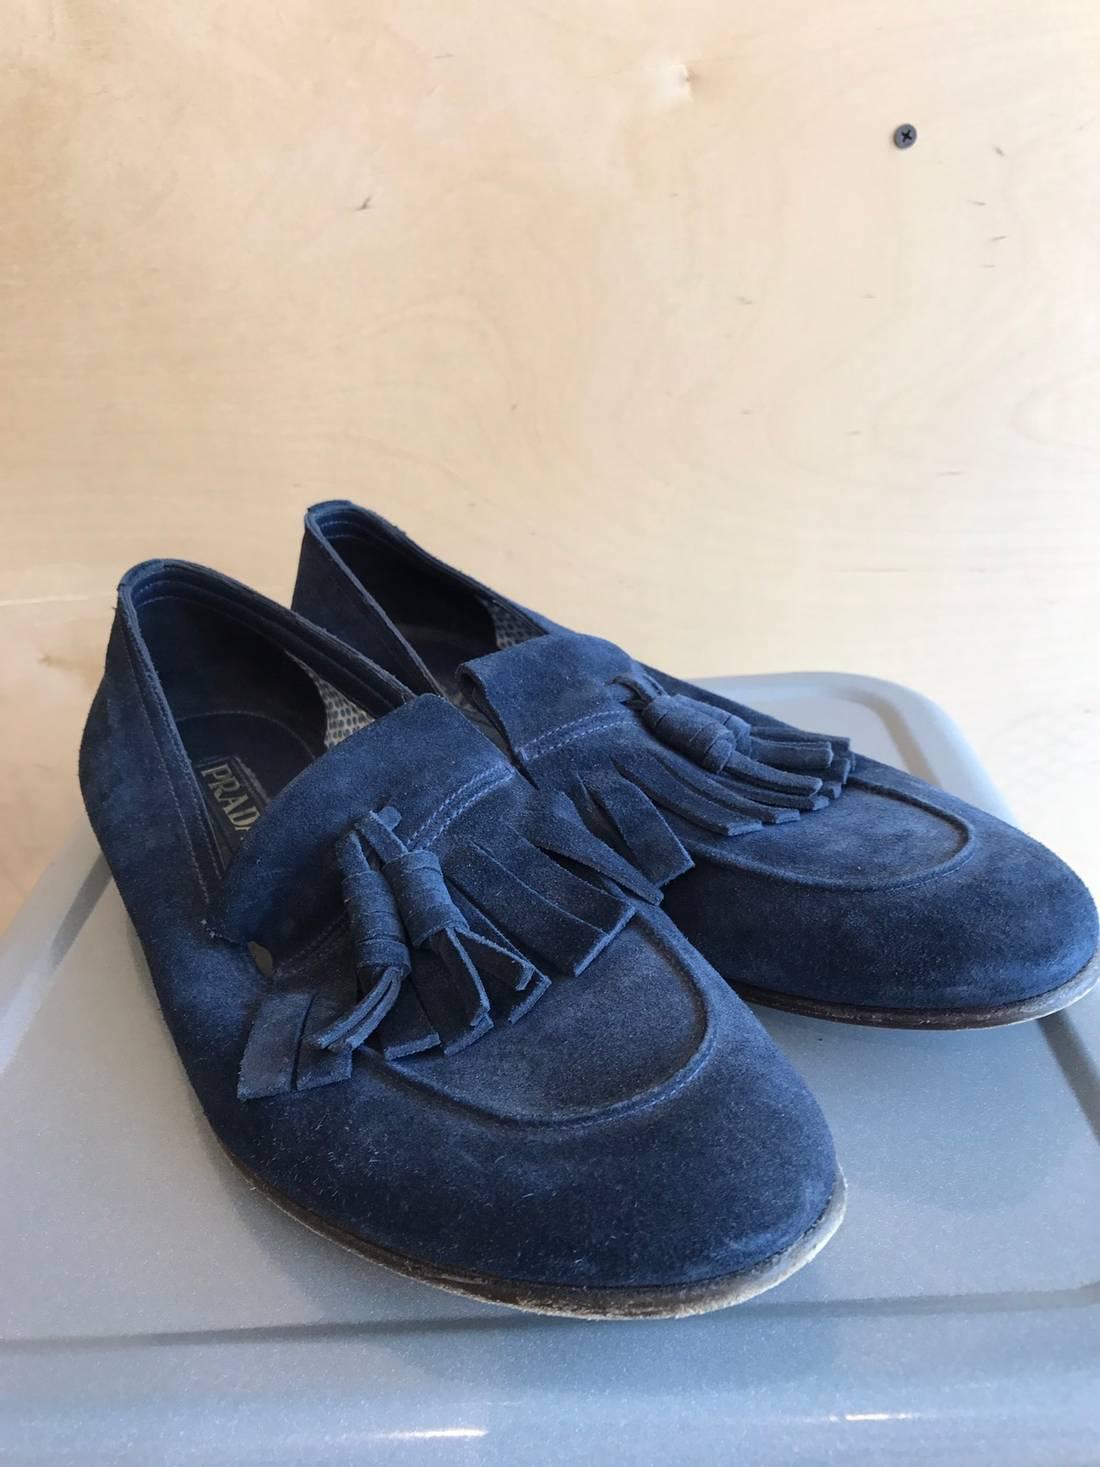 a16f5d70a55 cheap prada blue casual loafers men shoes free postage 1019073 b6347 3c4ff   where to buy prada blue suede tassel loafer size us 8 eu 41 1 56970 e09b8